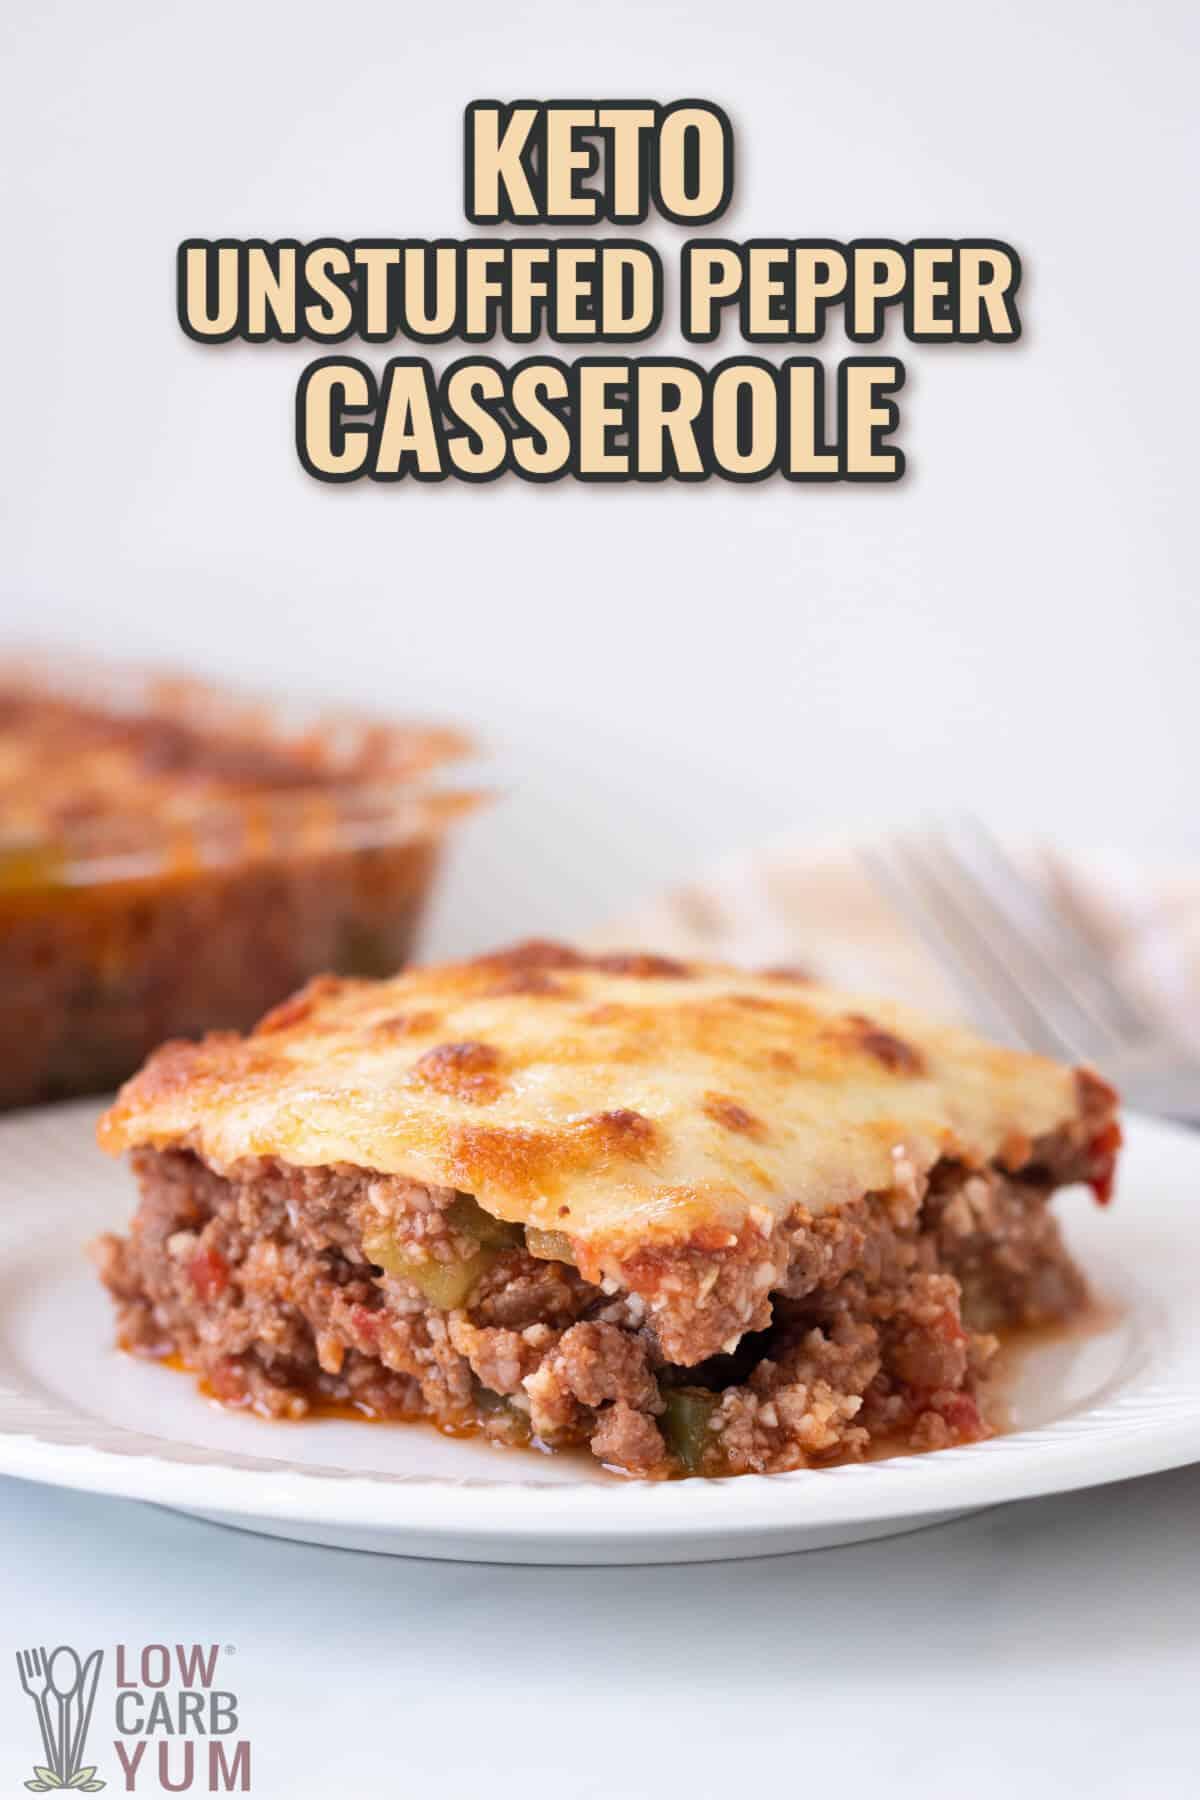 unstuffed pepper casserole cover image